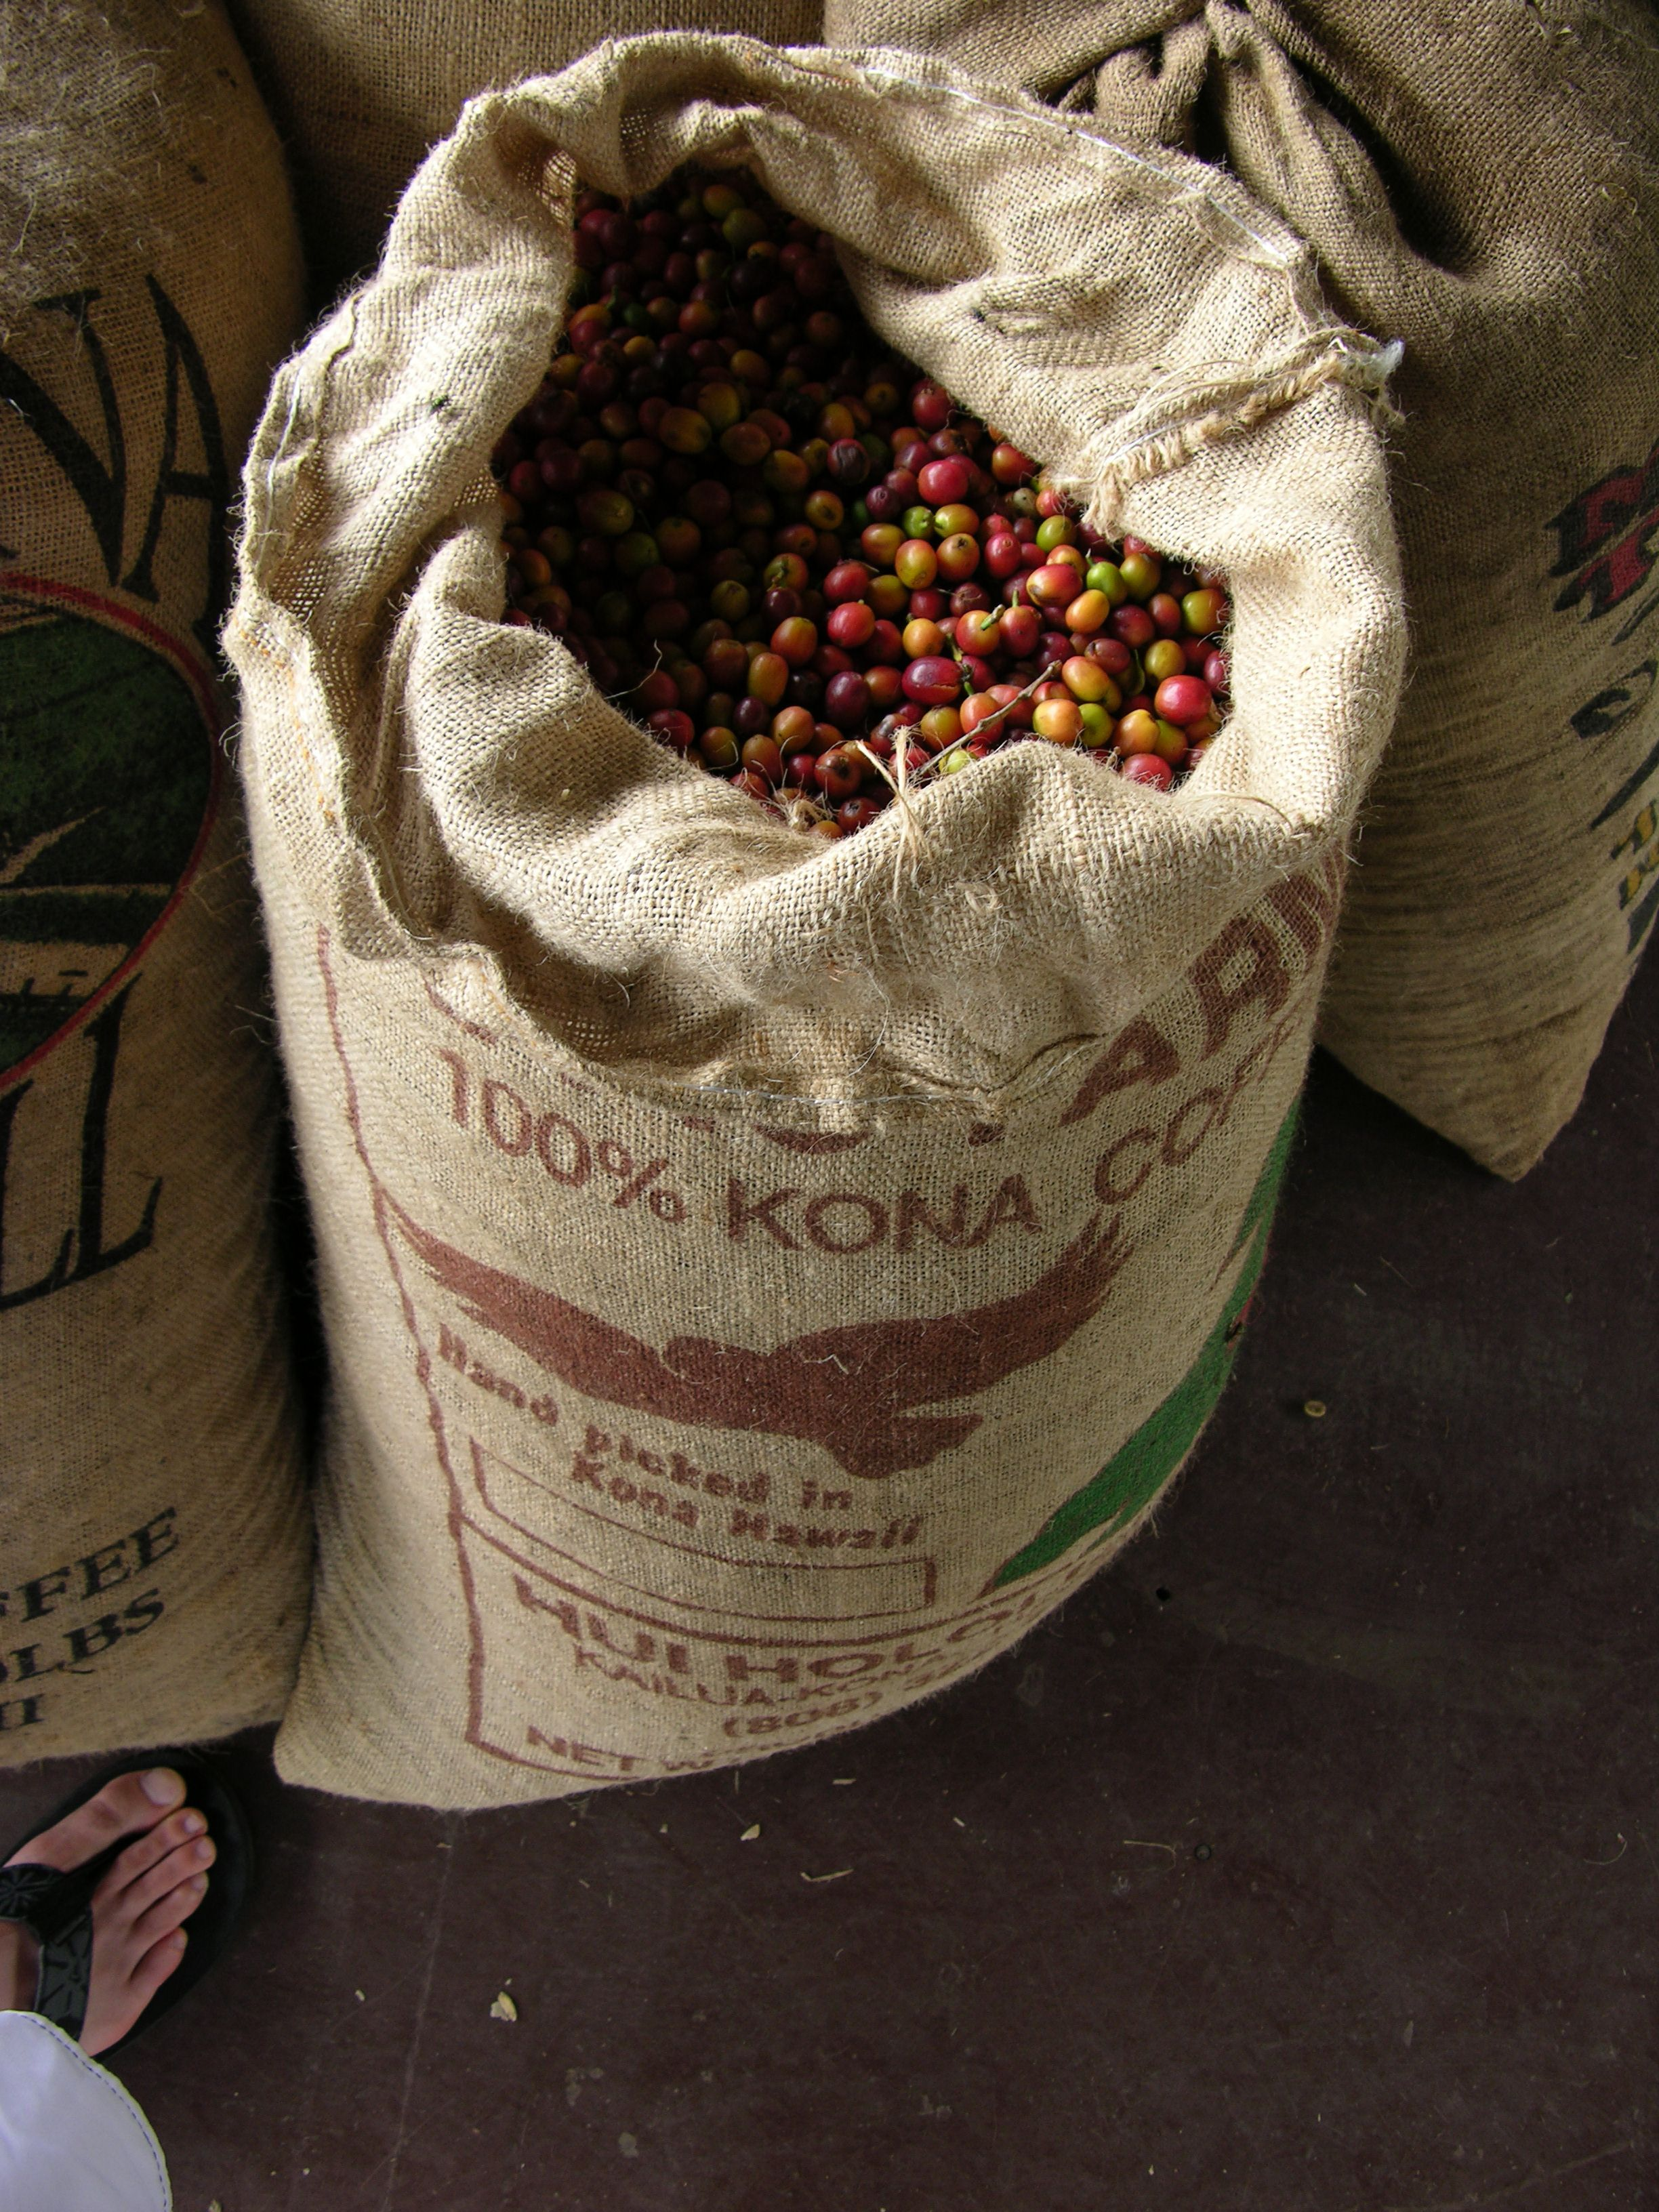 Kona coffee plantation